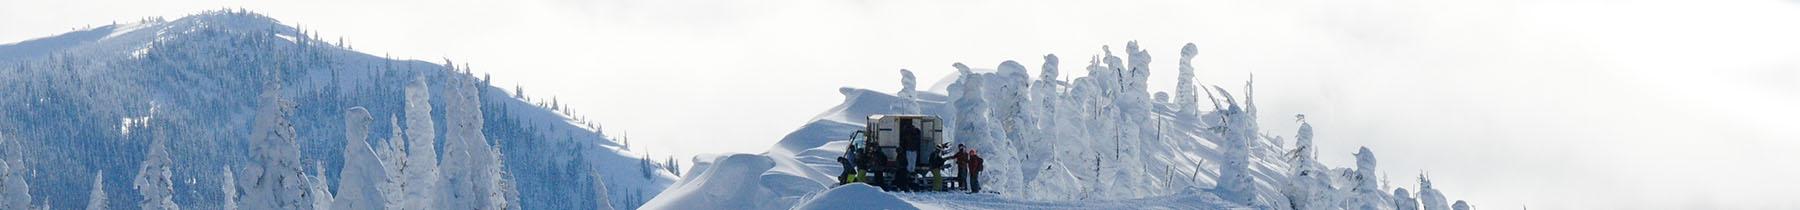 Utah Heli-Skiing: Park City & Snowbird